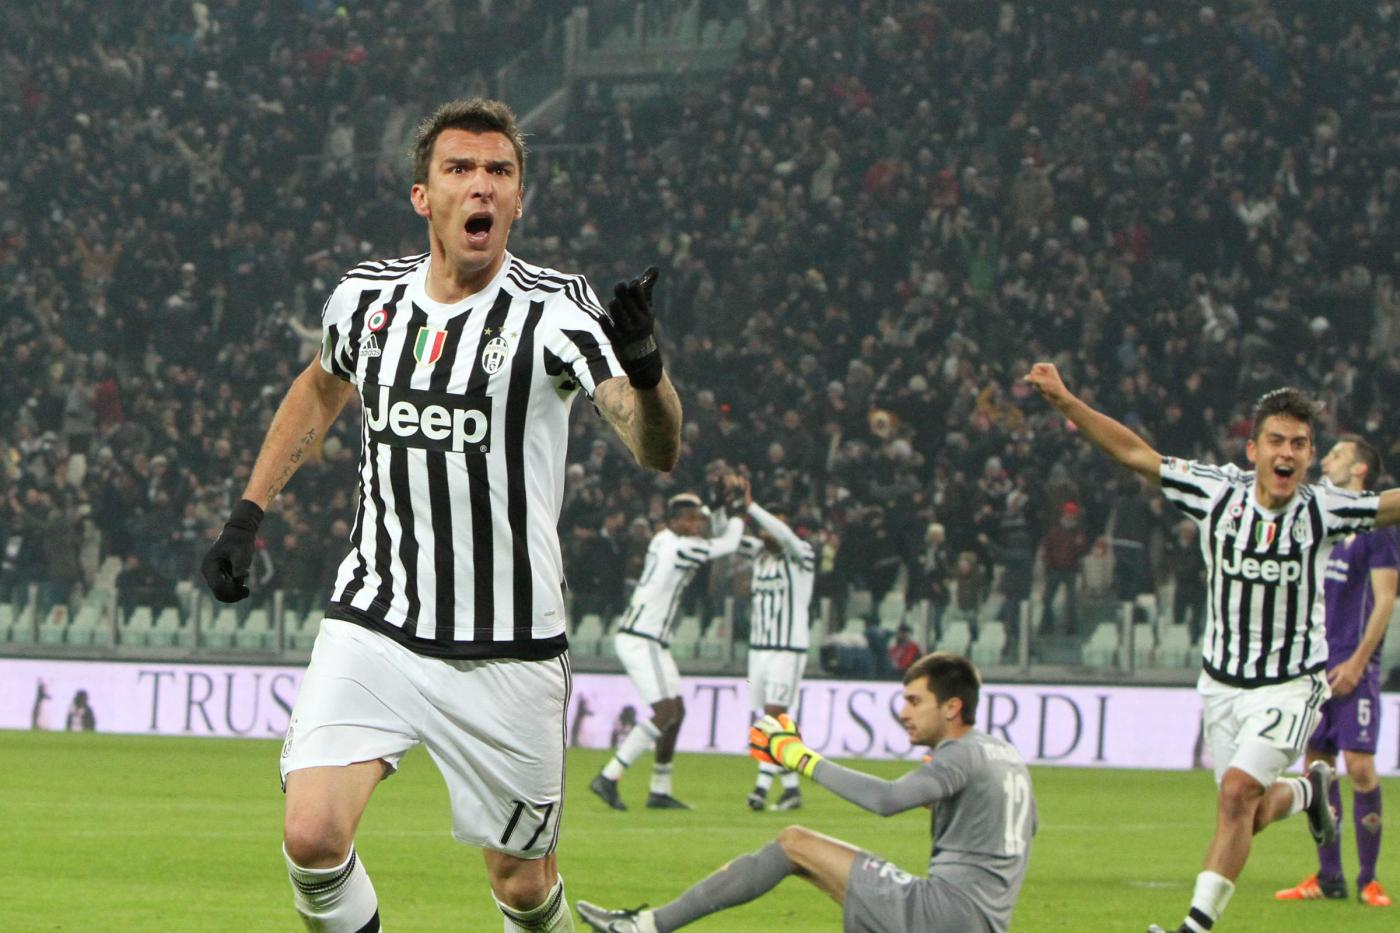 Juventus Fiorentina 3-1 serie A Tim 2015 2016 gol Mandzukic